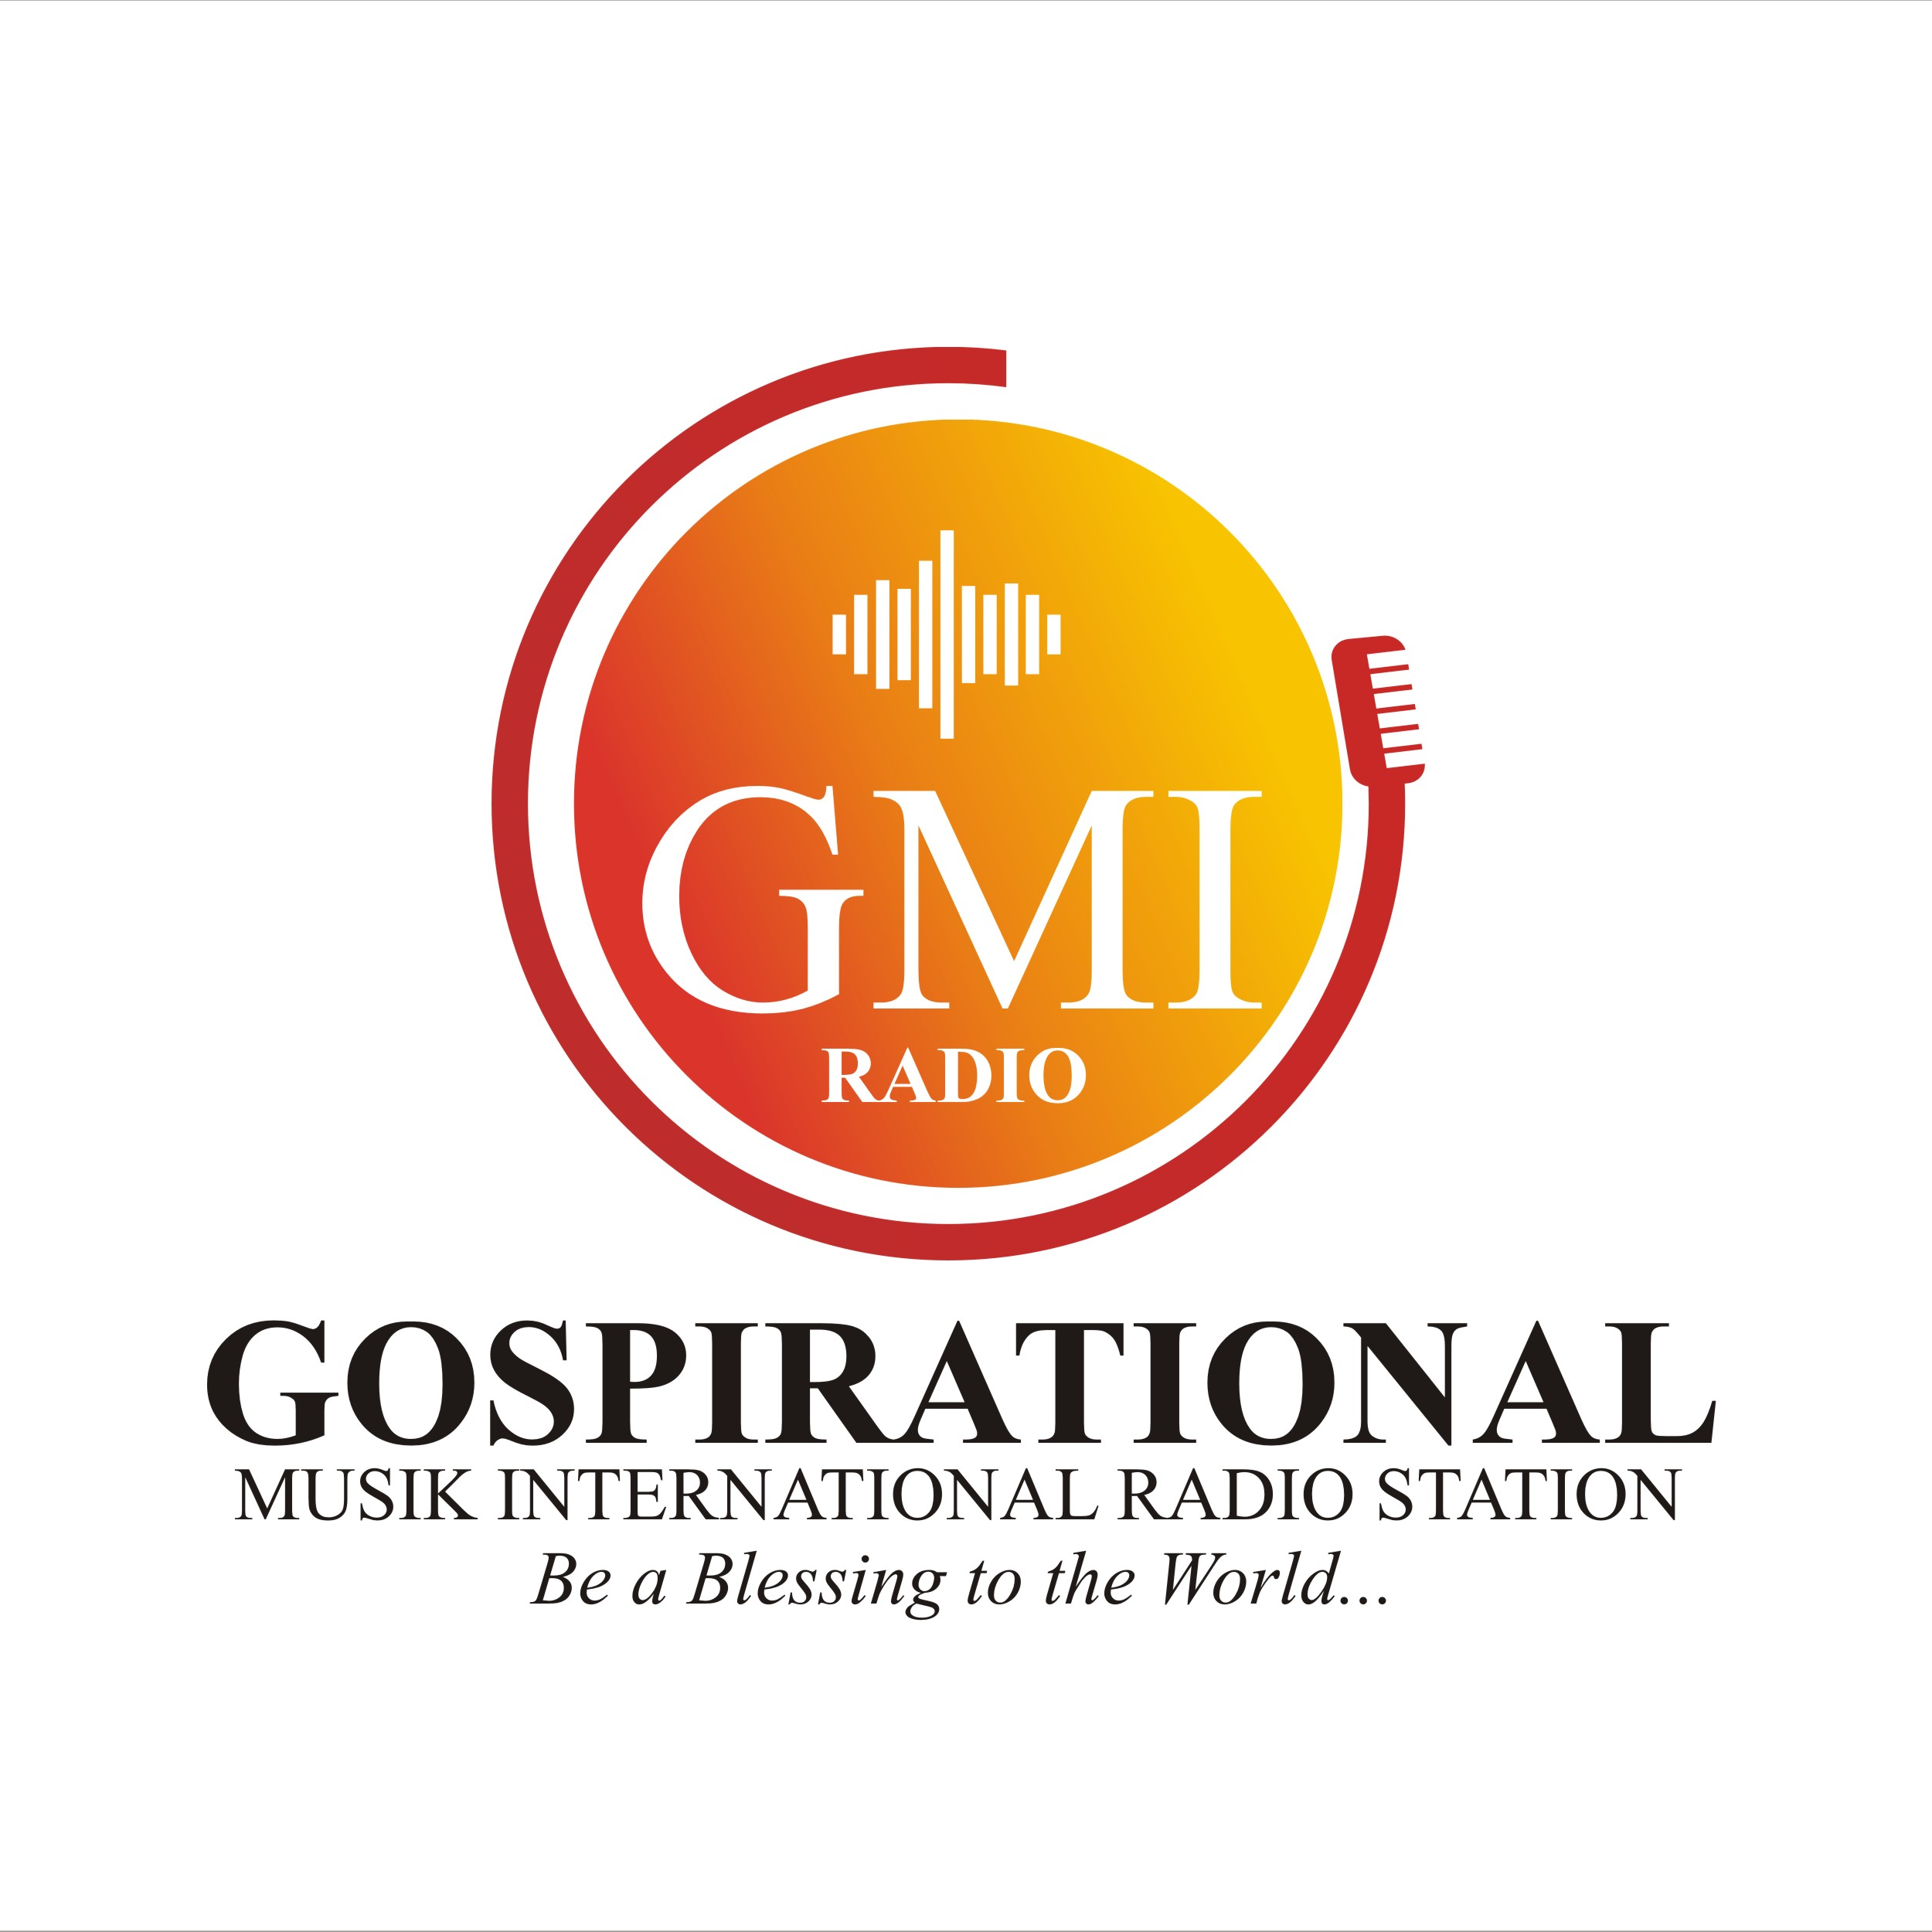 GMI RADIO (Gospirational Music International Radio)